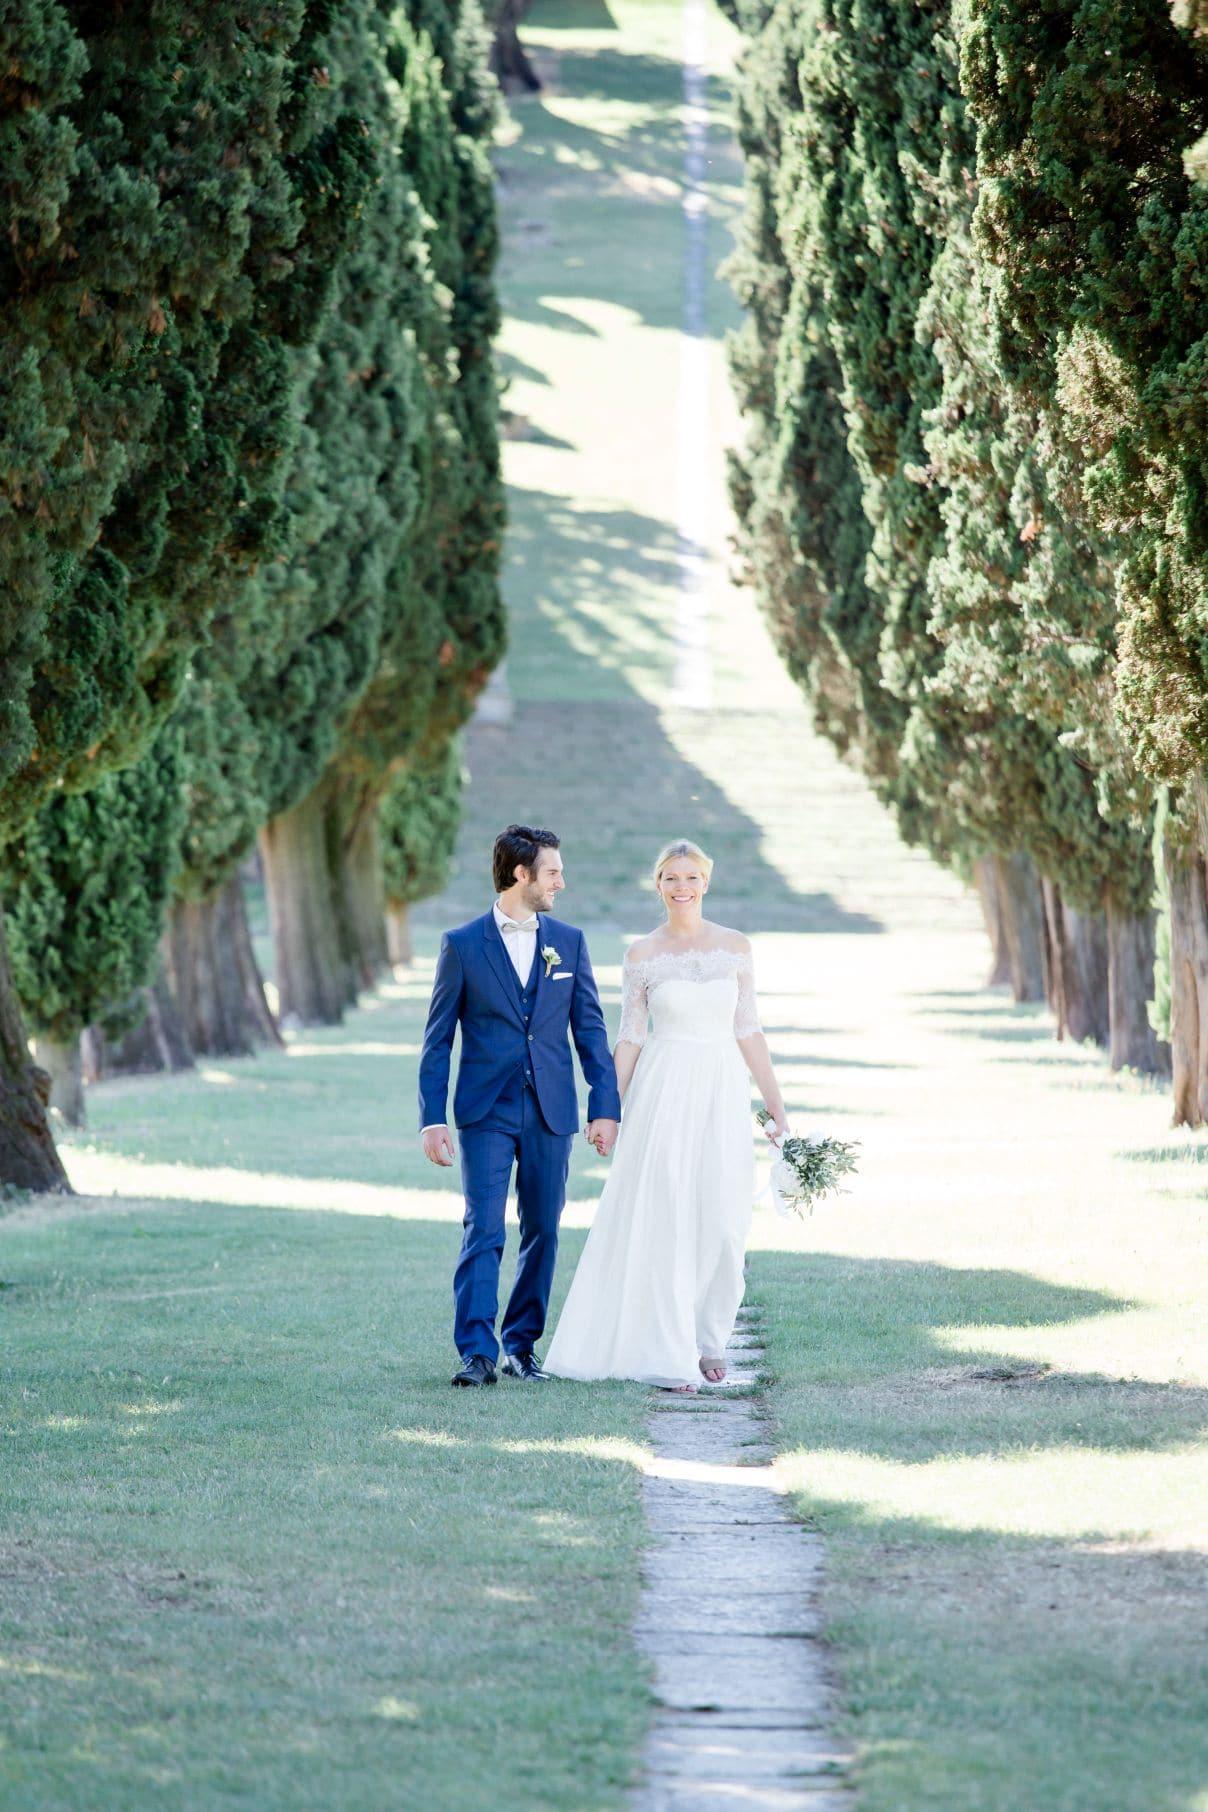 Million Memories_A&D_Hochzeitsfotograf_Schlosshochzeit_Toskana_Lago Di Como_Wedding_Tuscany_105